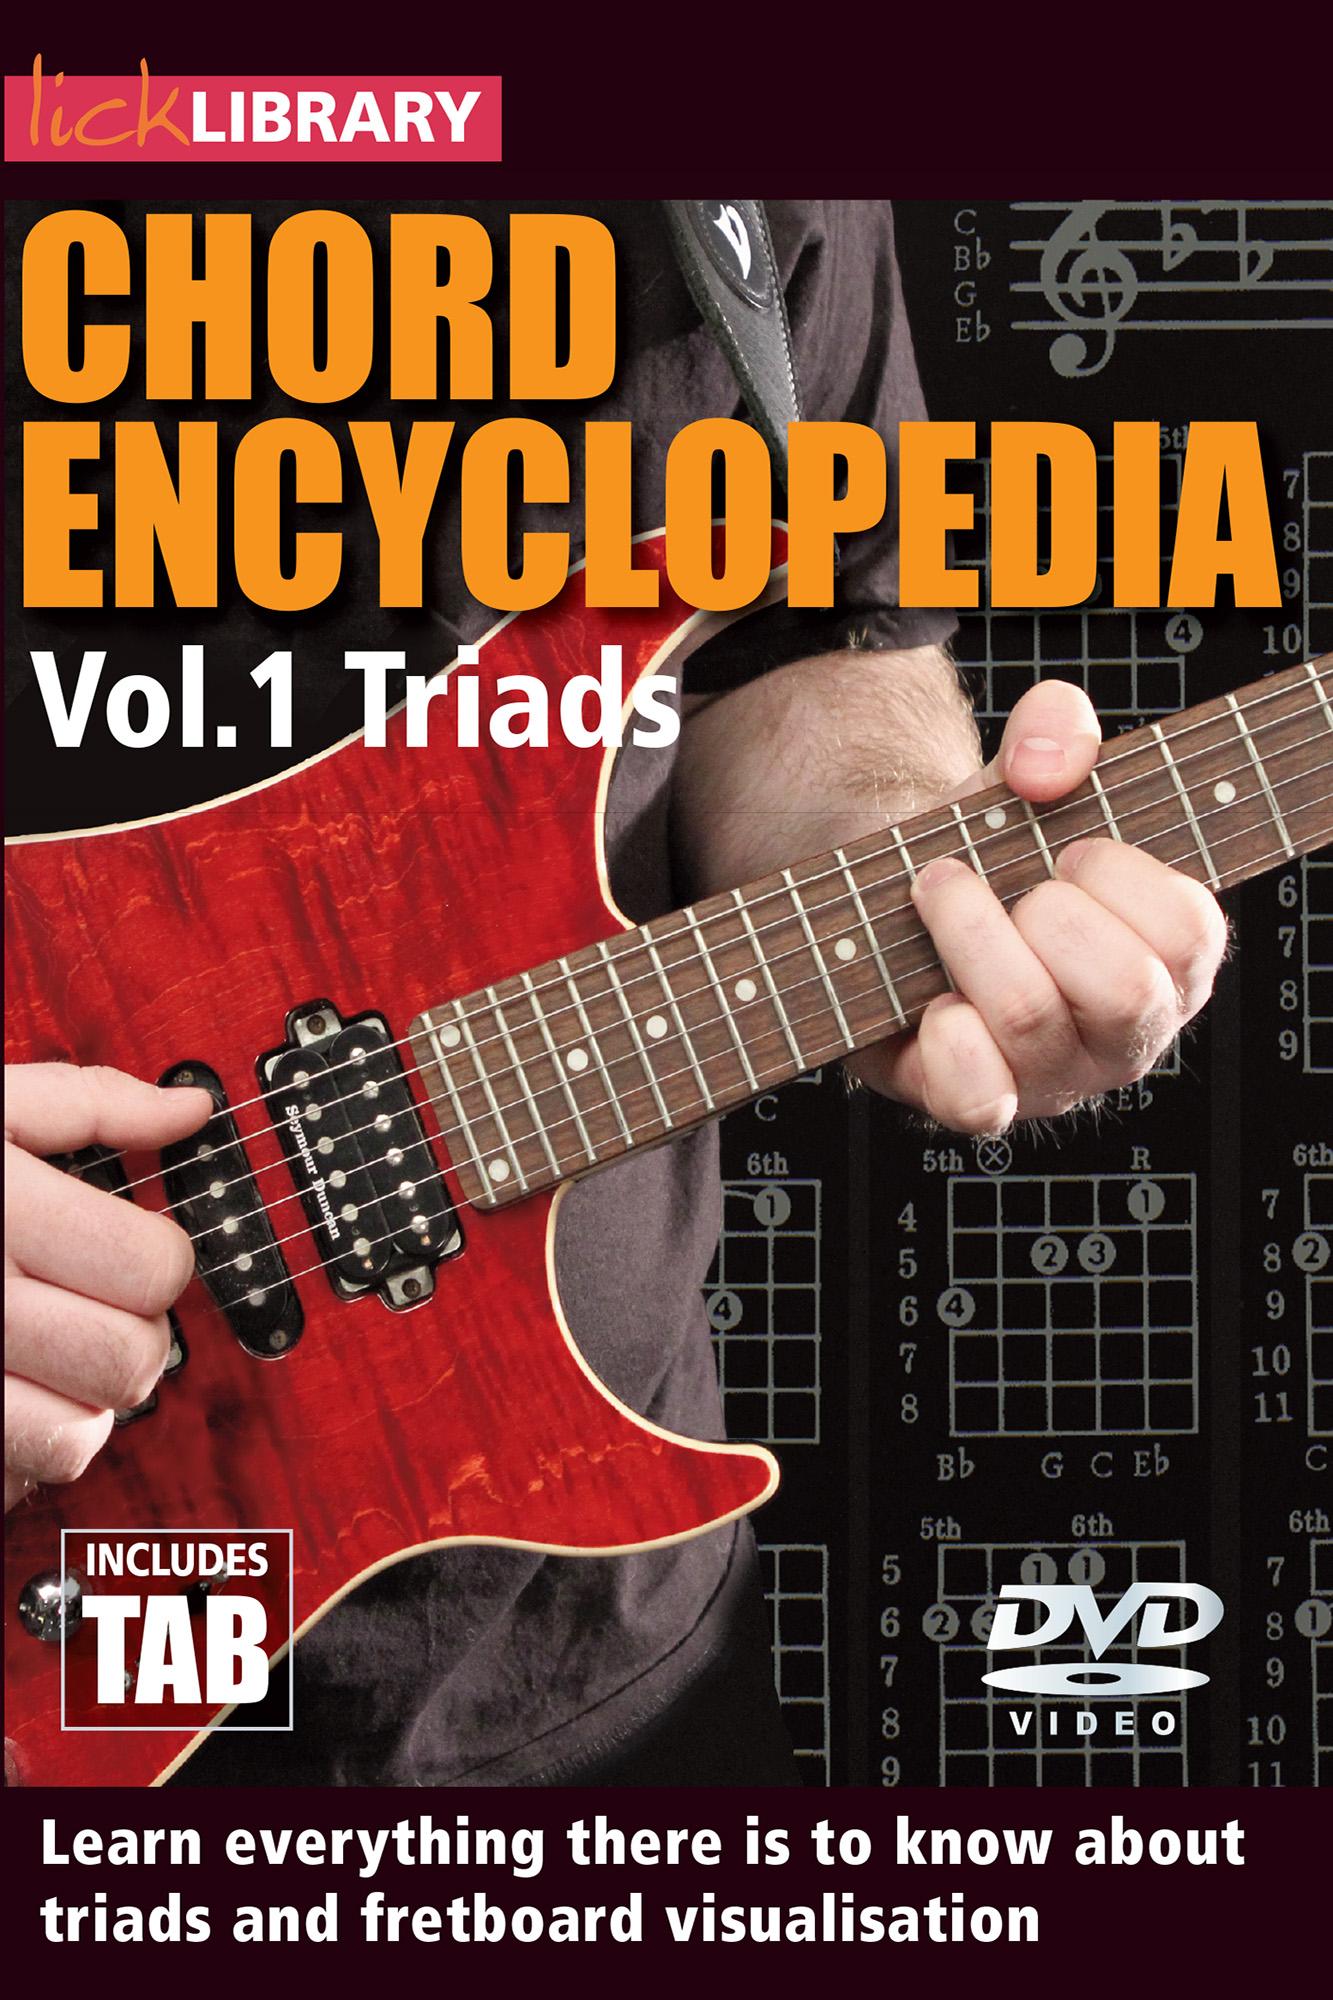 Chord Encyclopedia Volume 1  -Triads